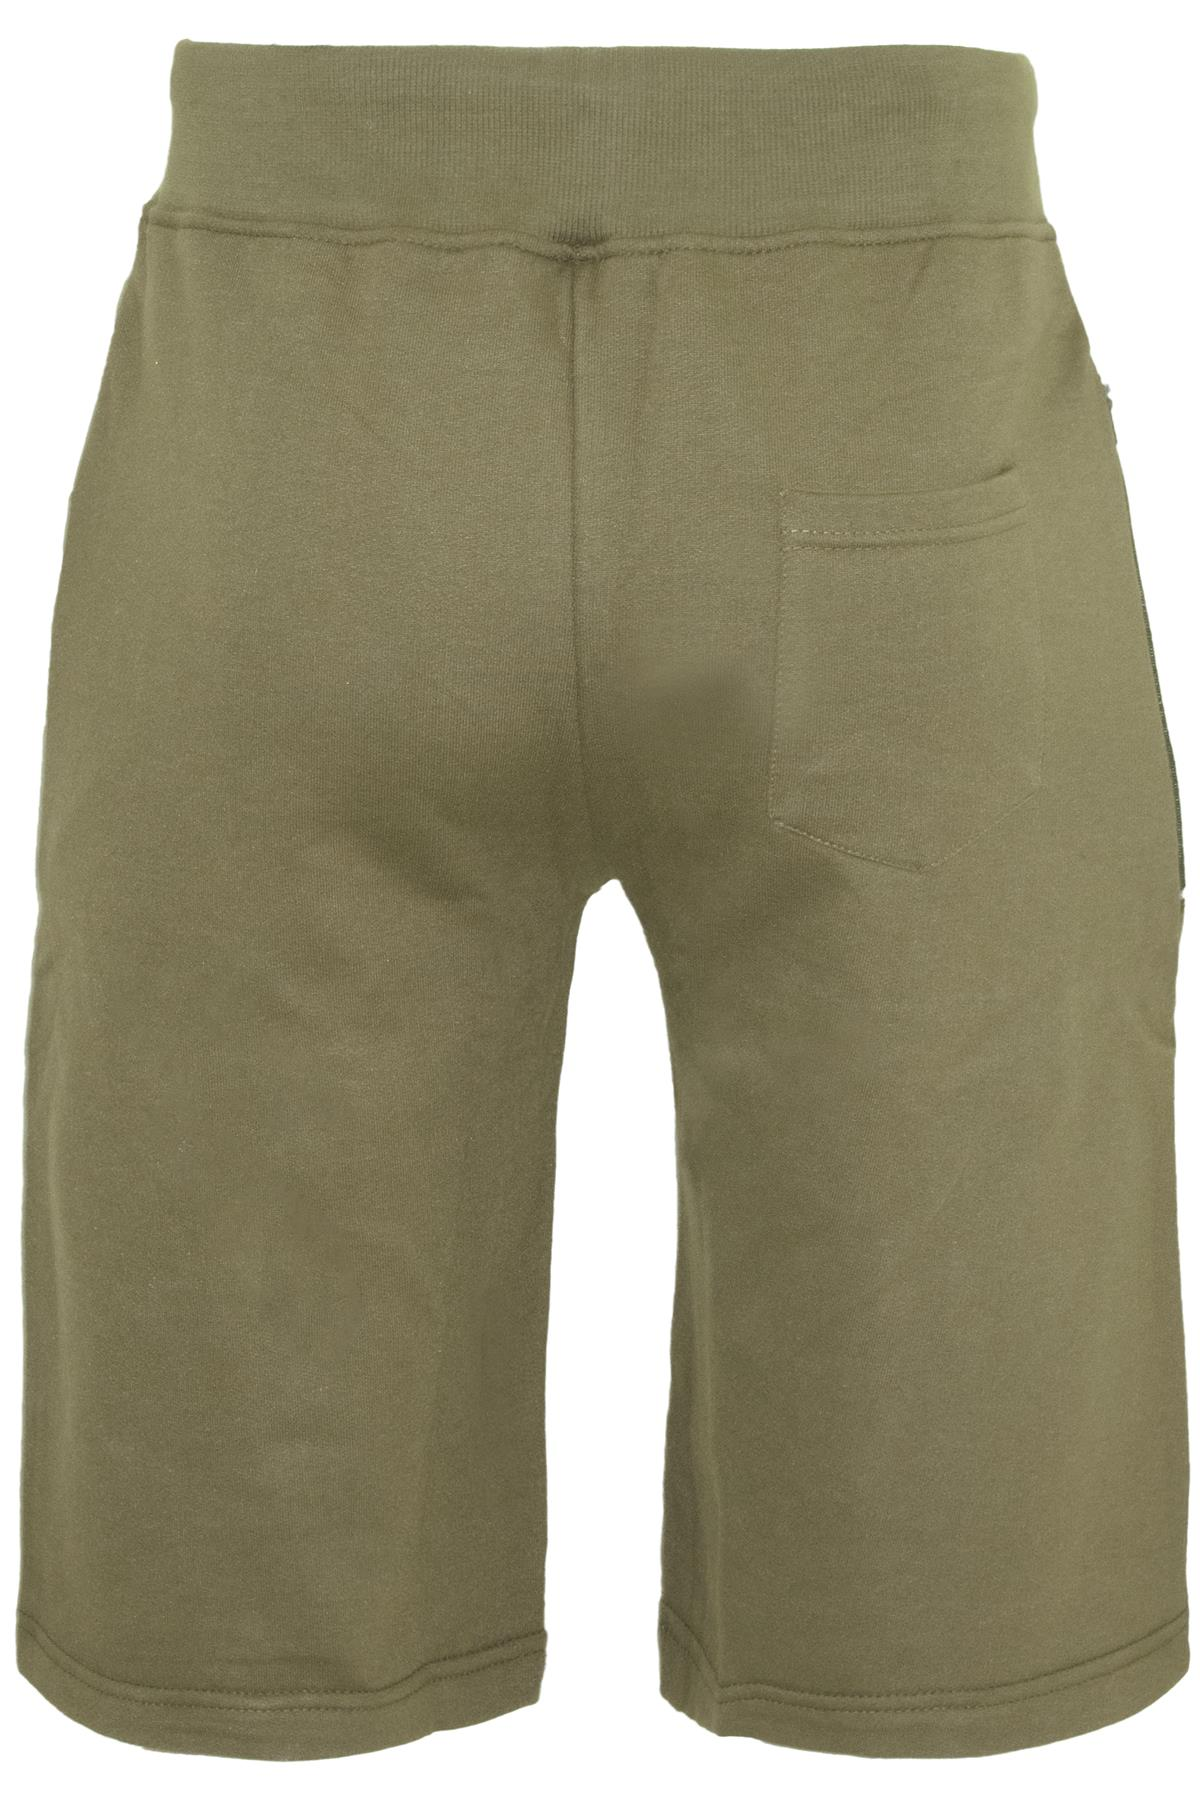 Mens-Contrast-Panel-Running-Summer-Side-Slit-Knee-Length-Fleece-Bottoms-Shorts thumbnail 42